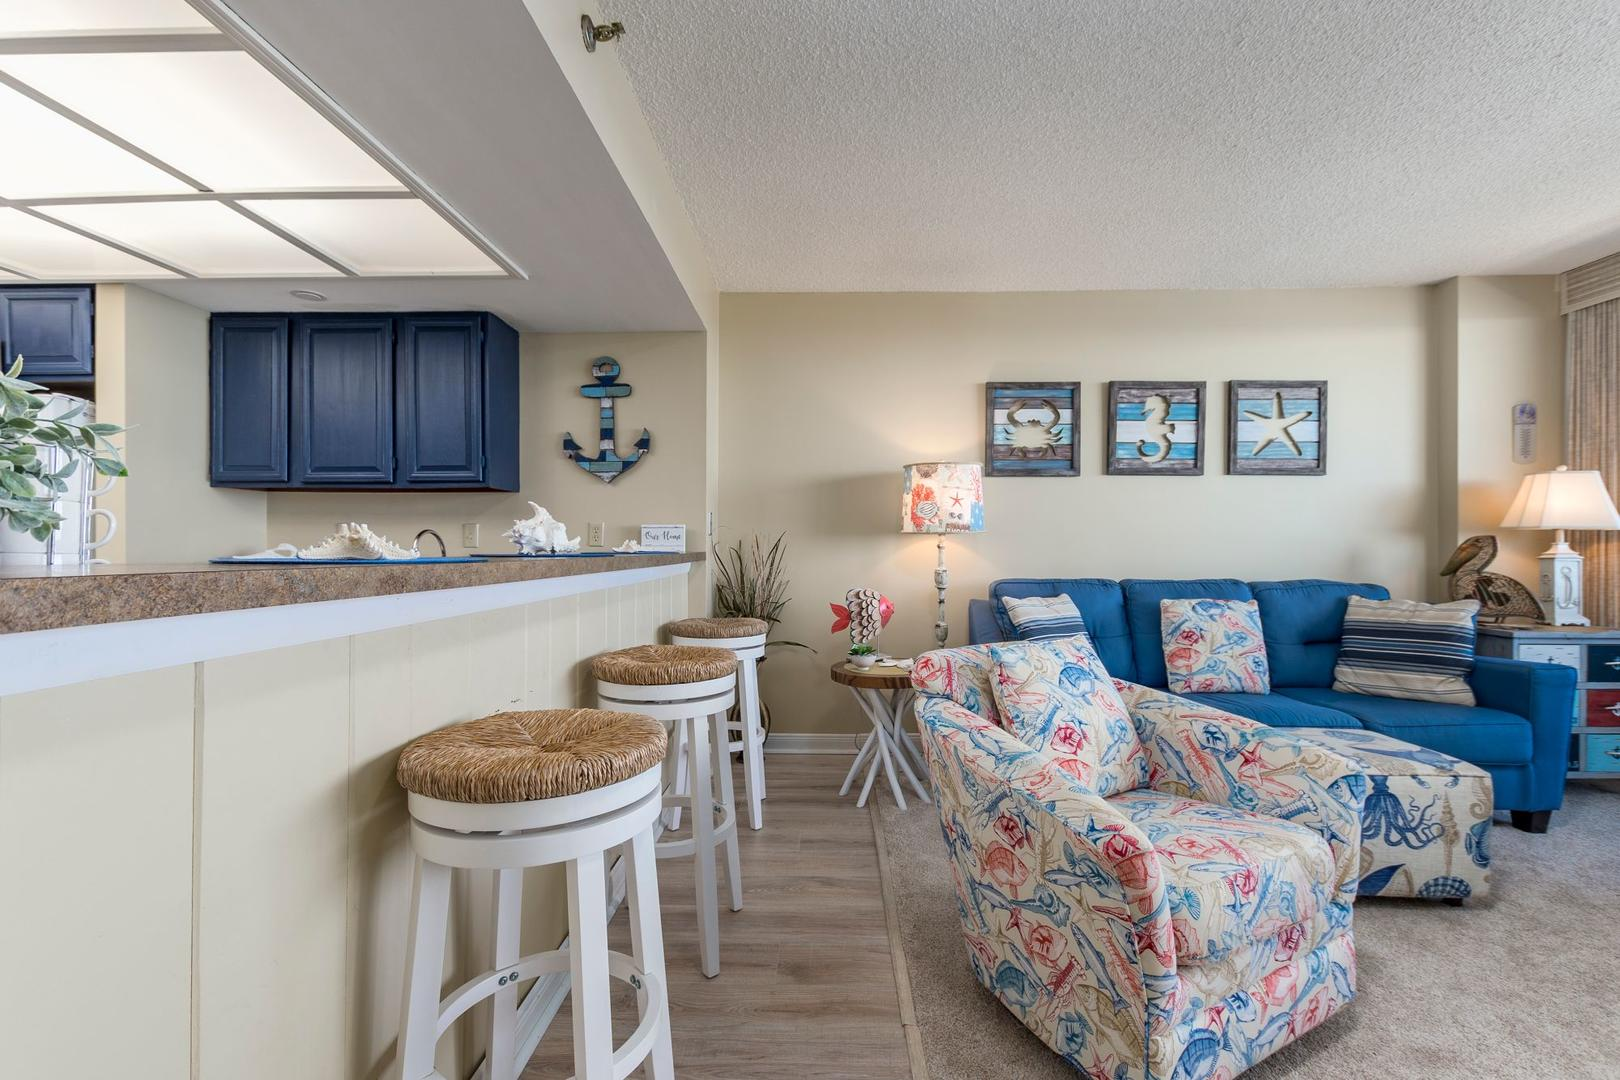 Century I 2203 - Living Room and Breakfast Bar